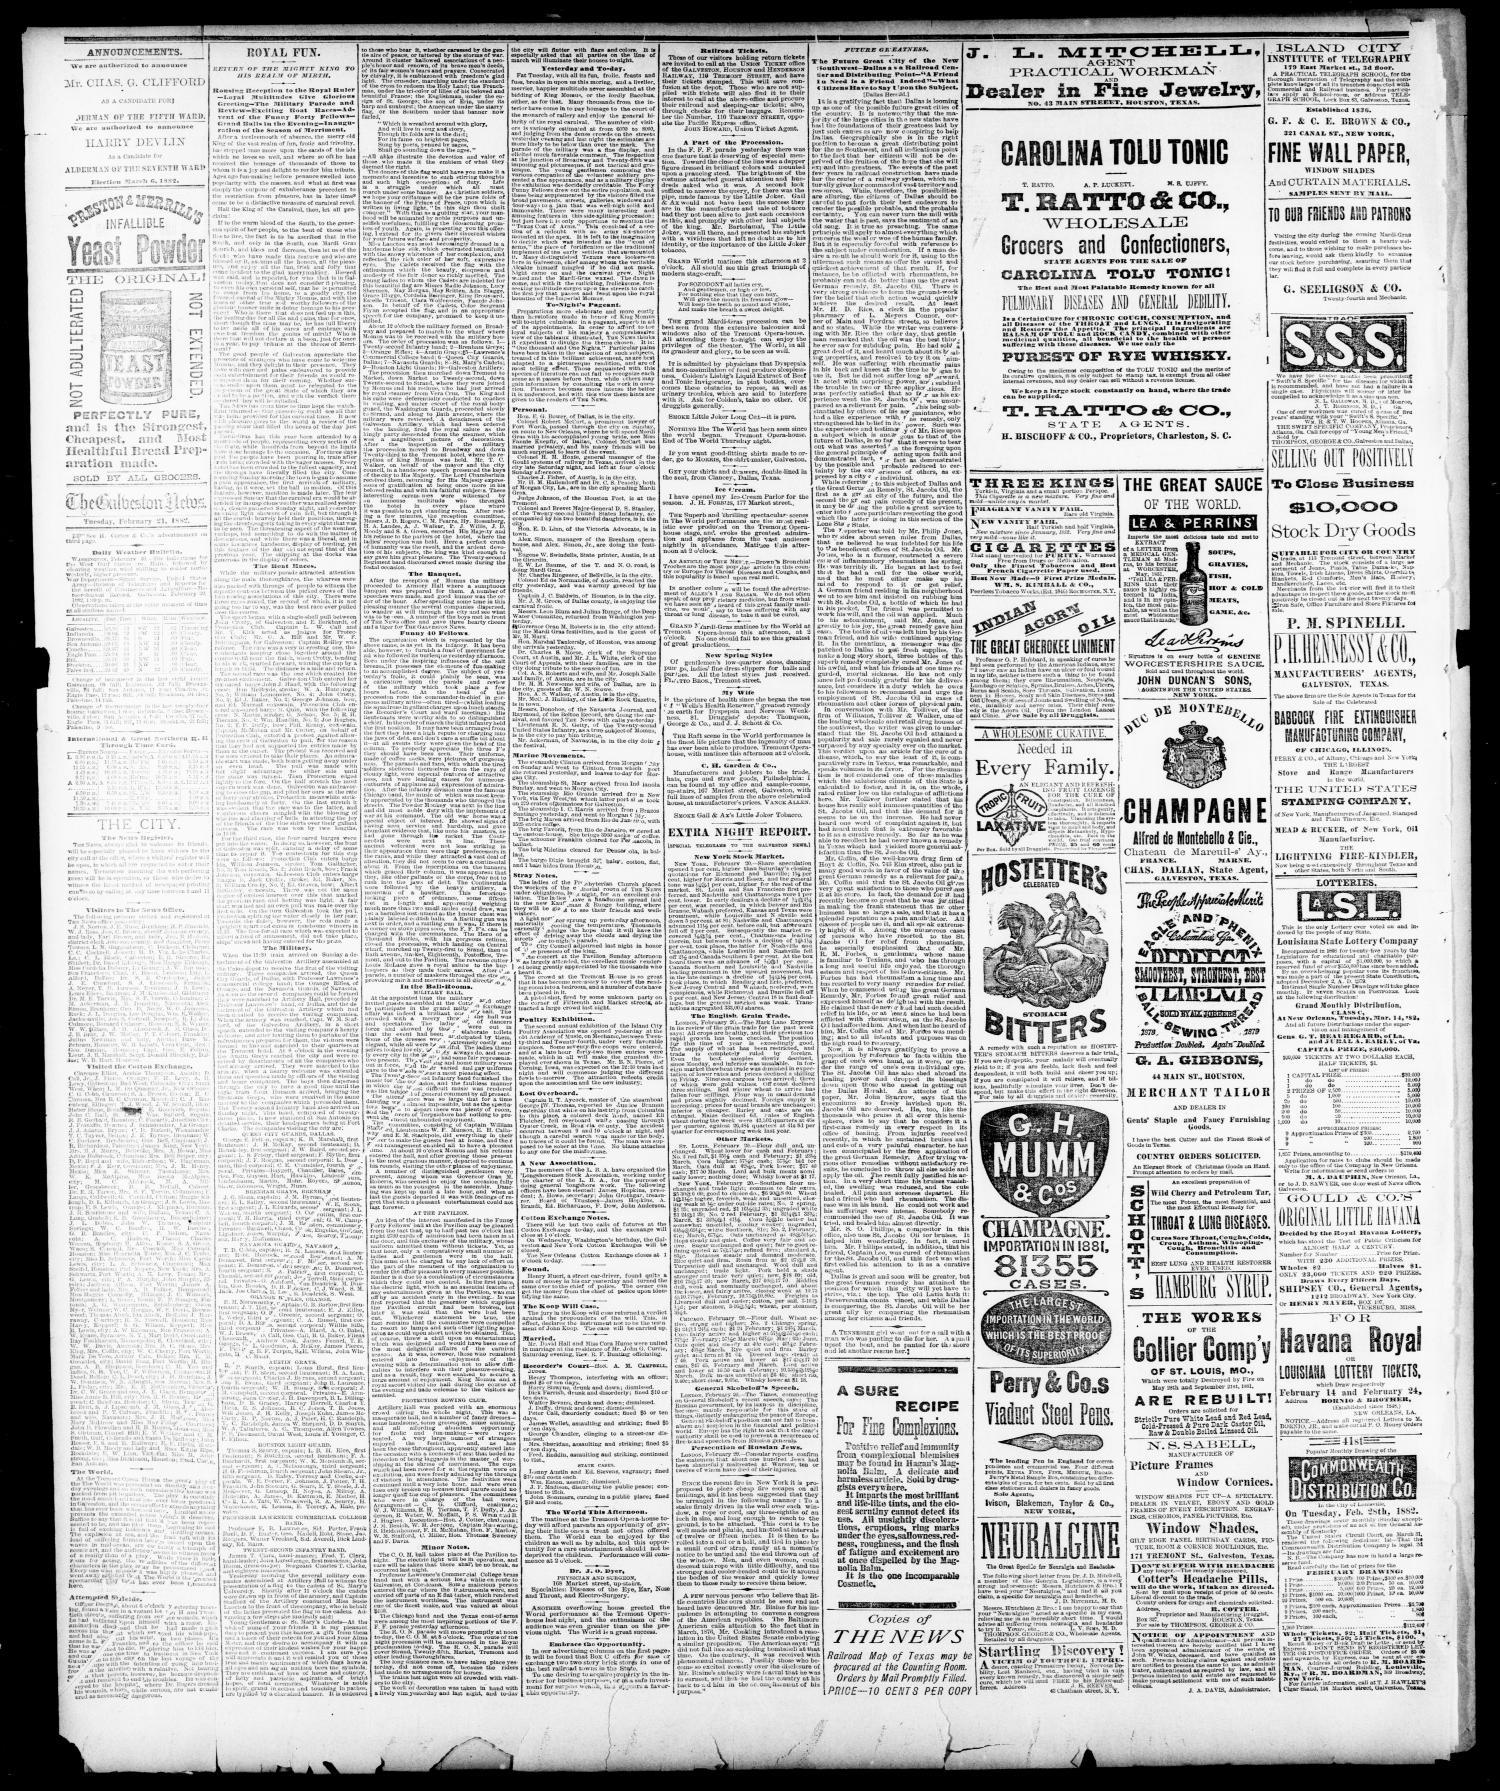 The Galveston Daily News  (Galveston, Tex ), Vol  40, No  287, Ed  1